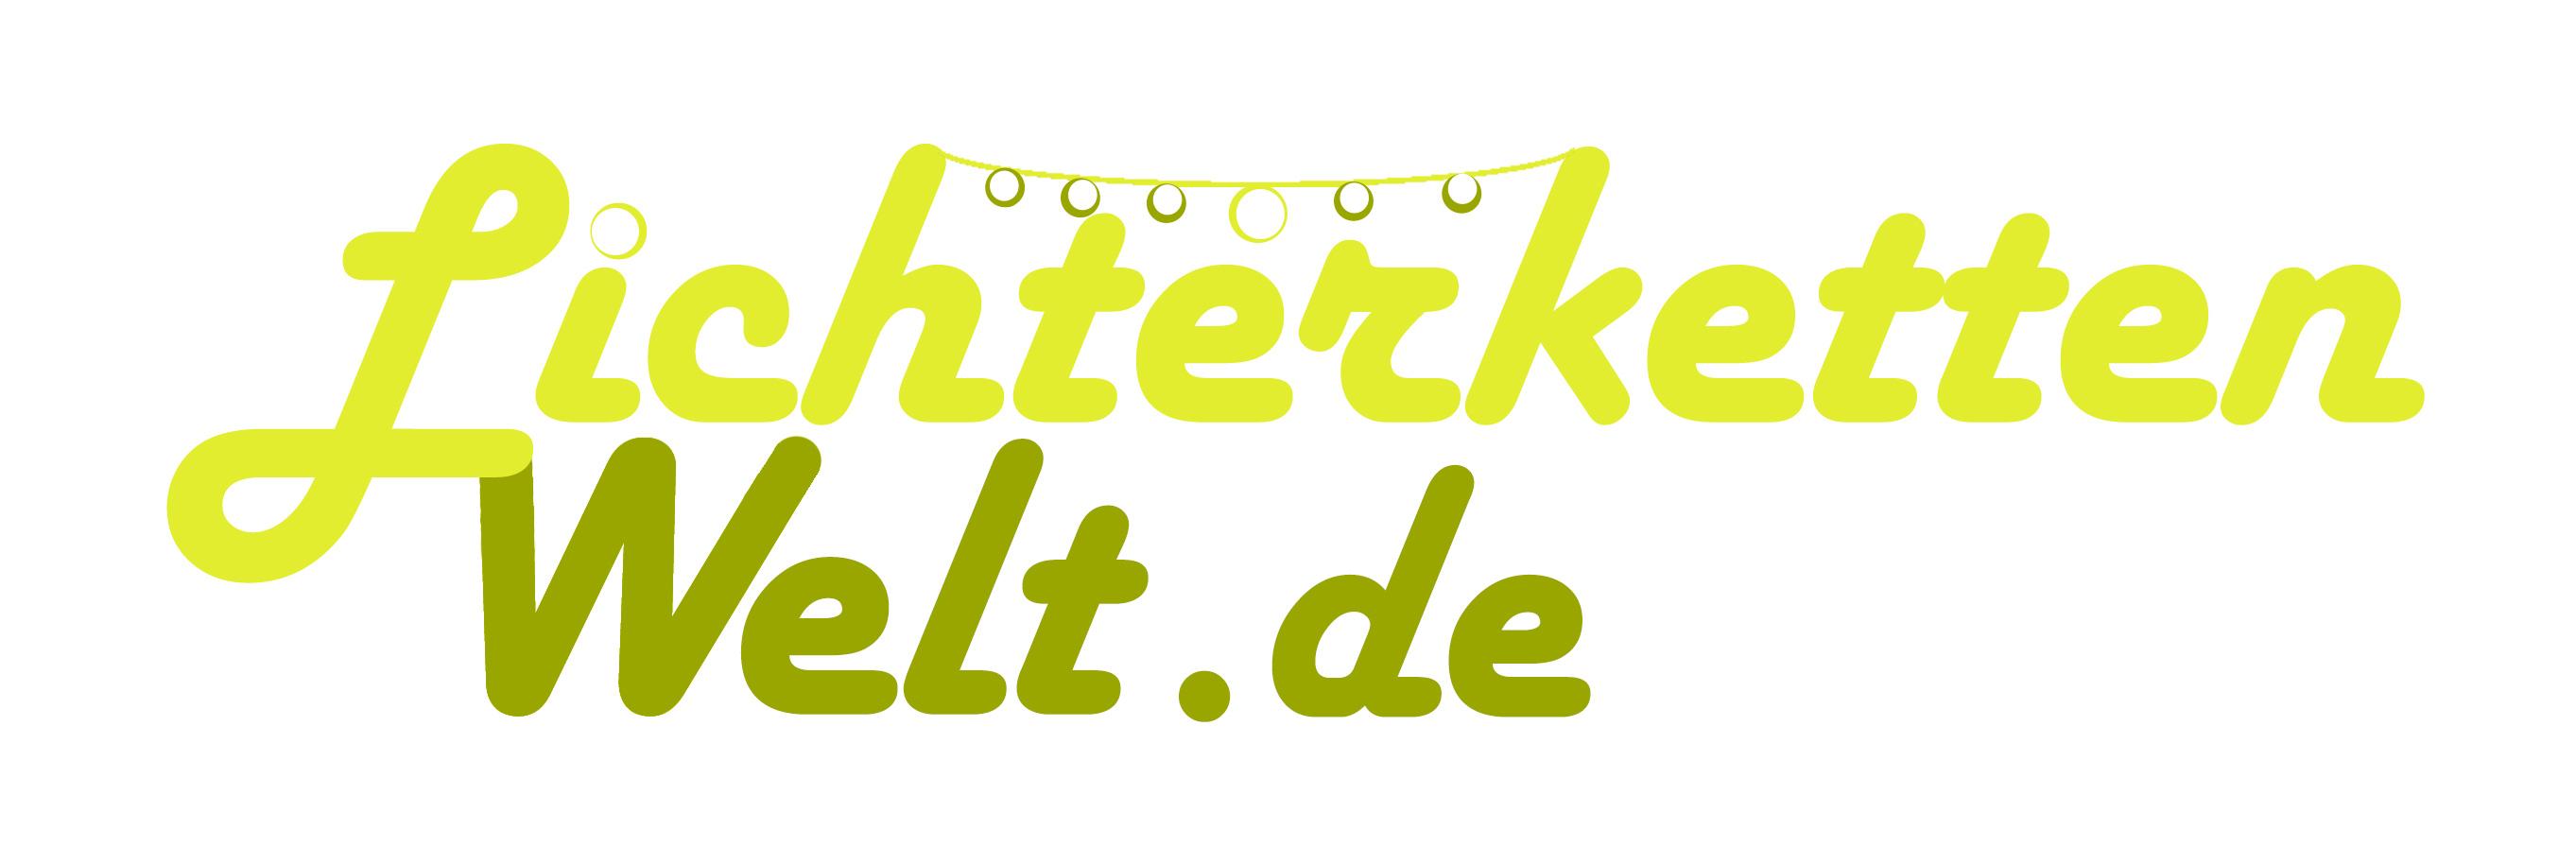 www.Lichterkettenwelt.de